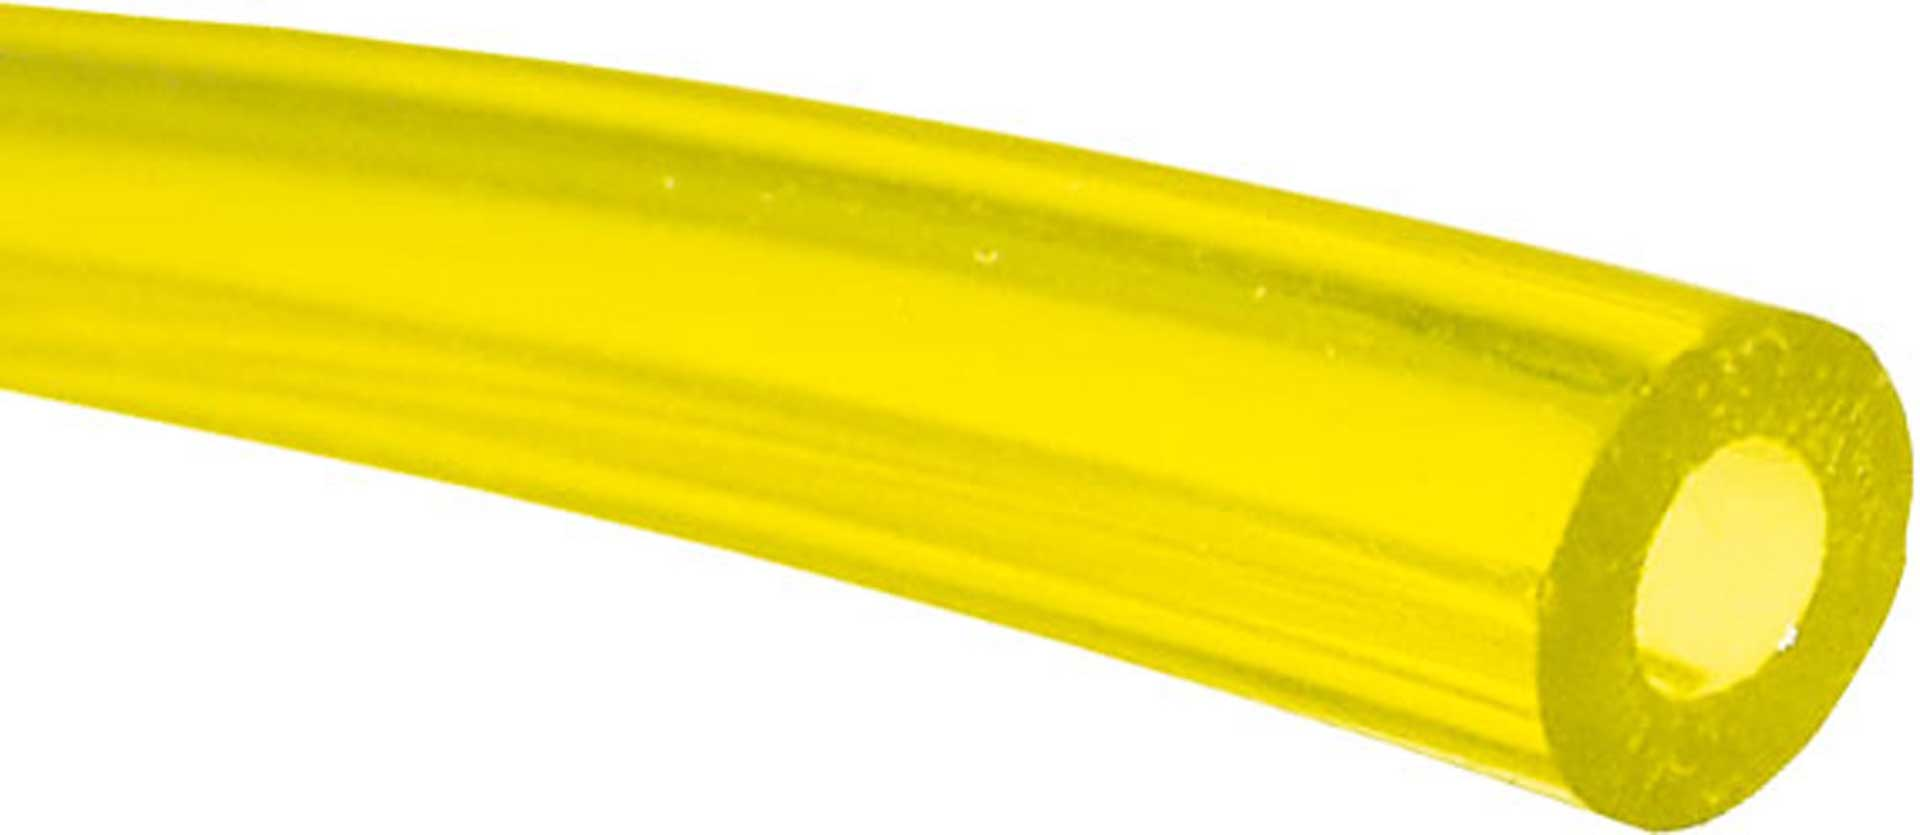 MODELLBAU LINDINGER GASOLINE HOSE TYGON 4,8/8MM 1FLM